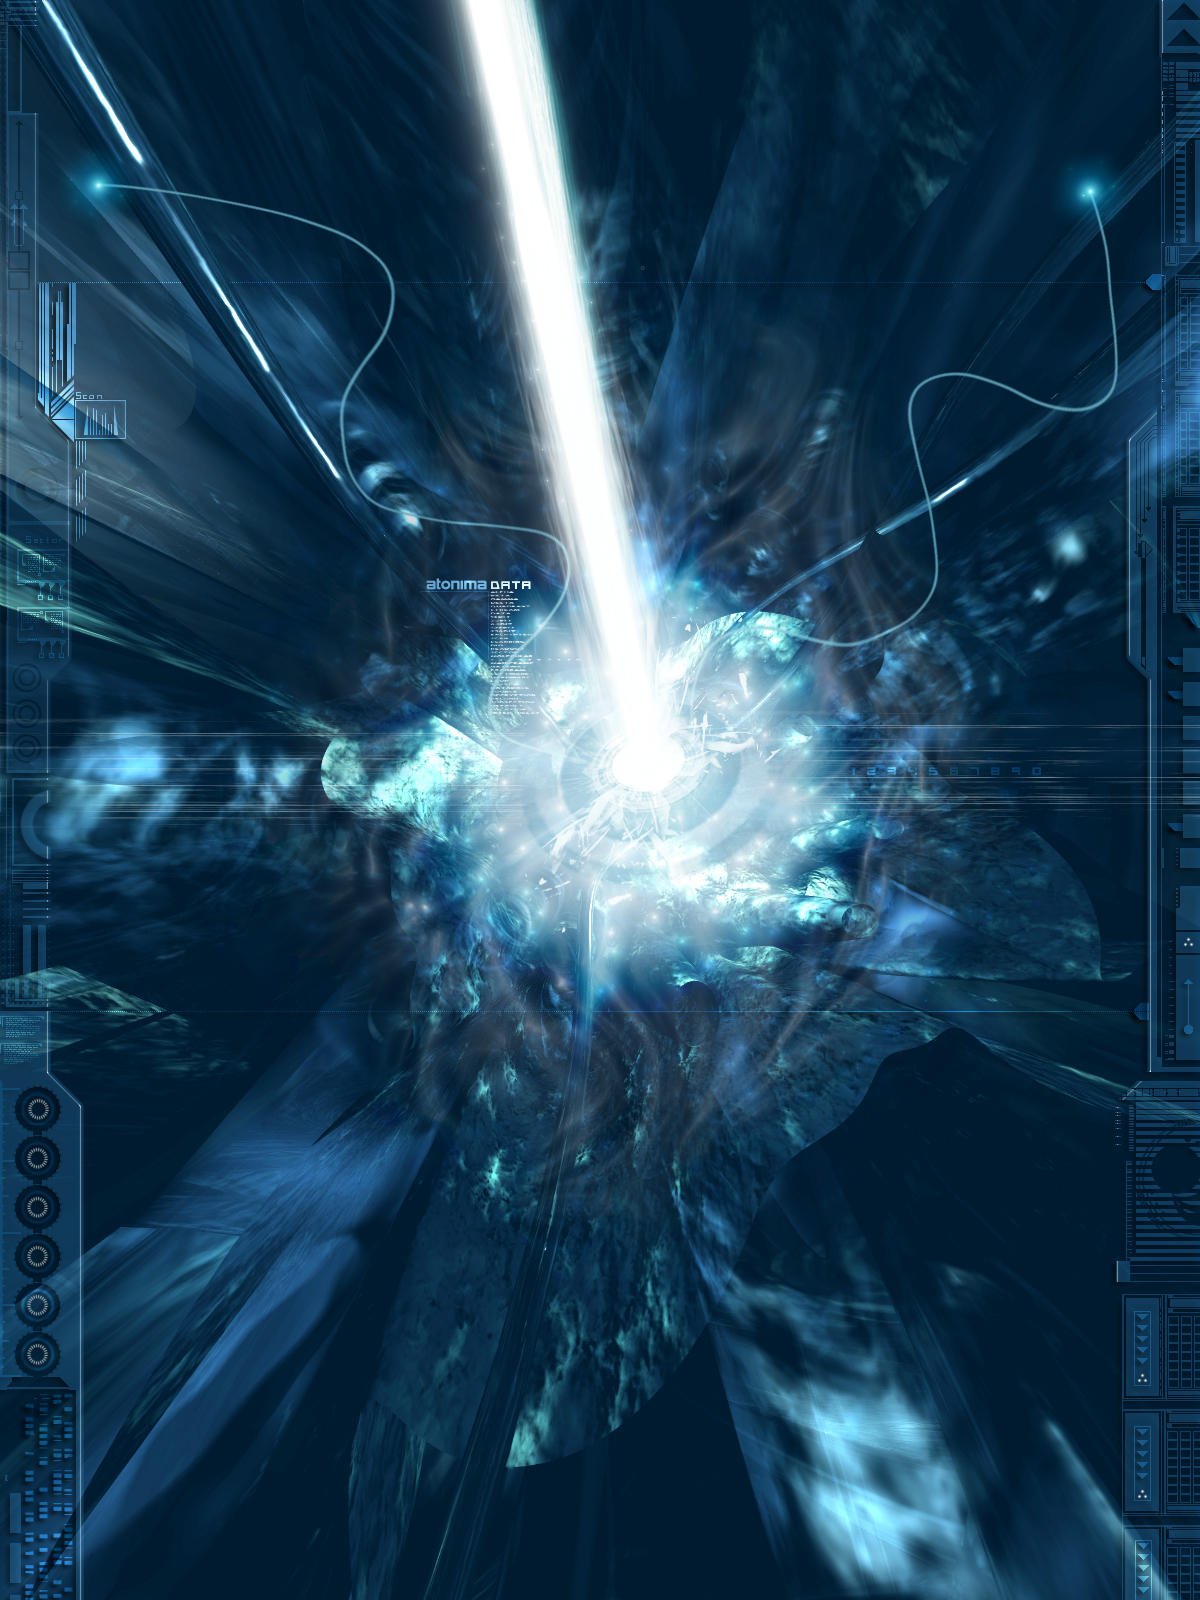 ATONIMA by viperv6